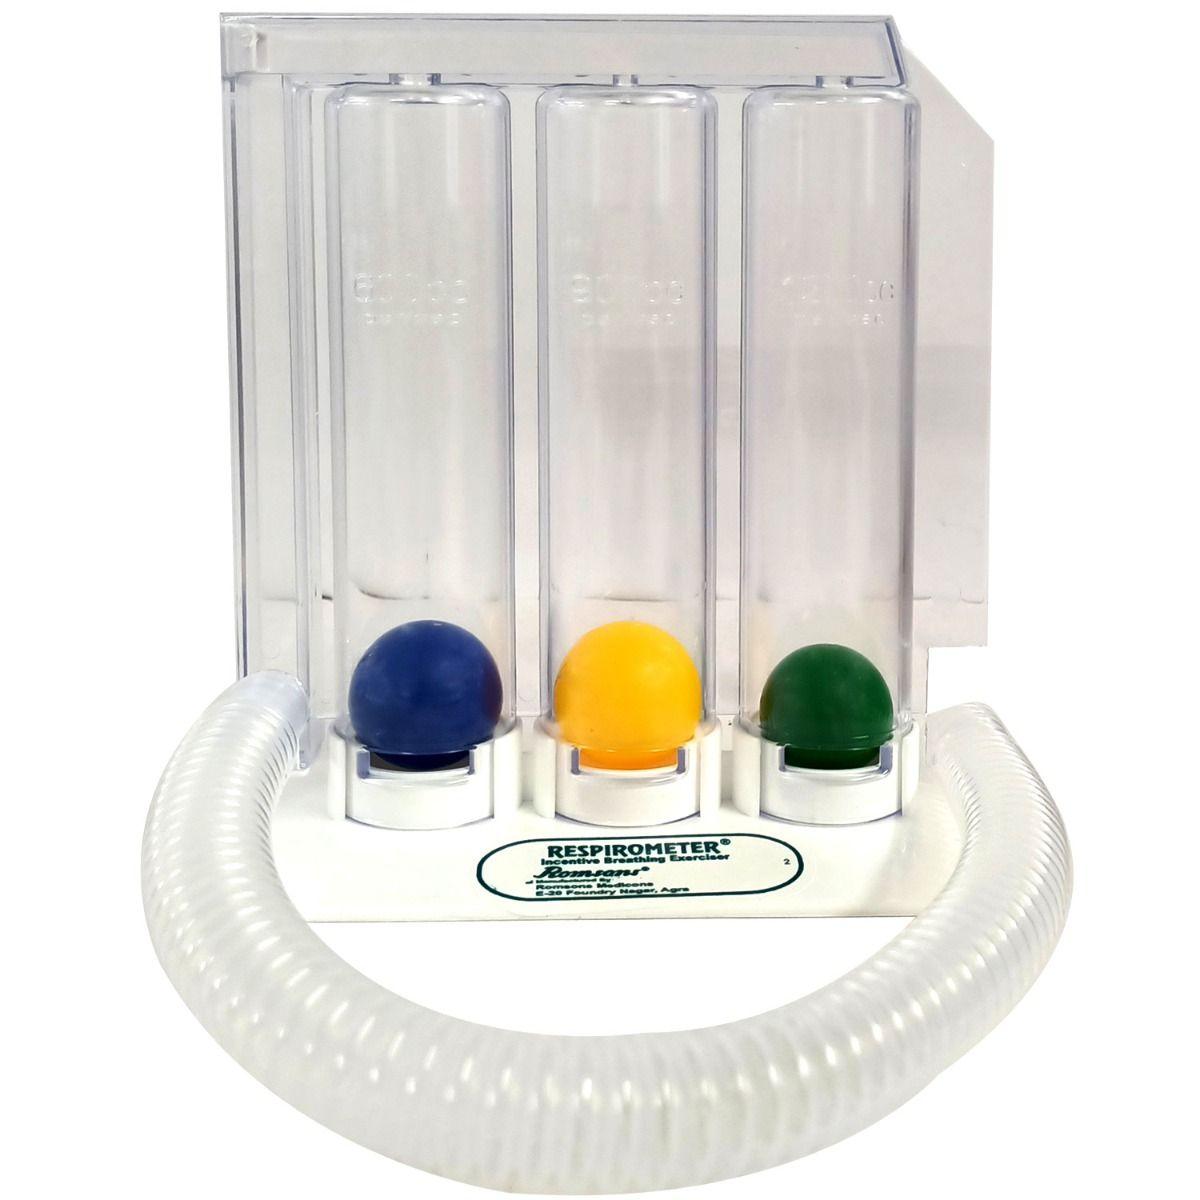 Romsons Respirometer SH-6082, 1 Count